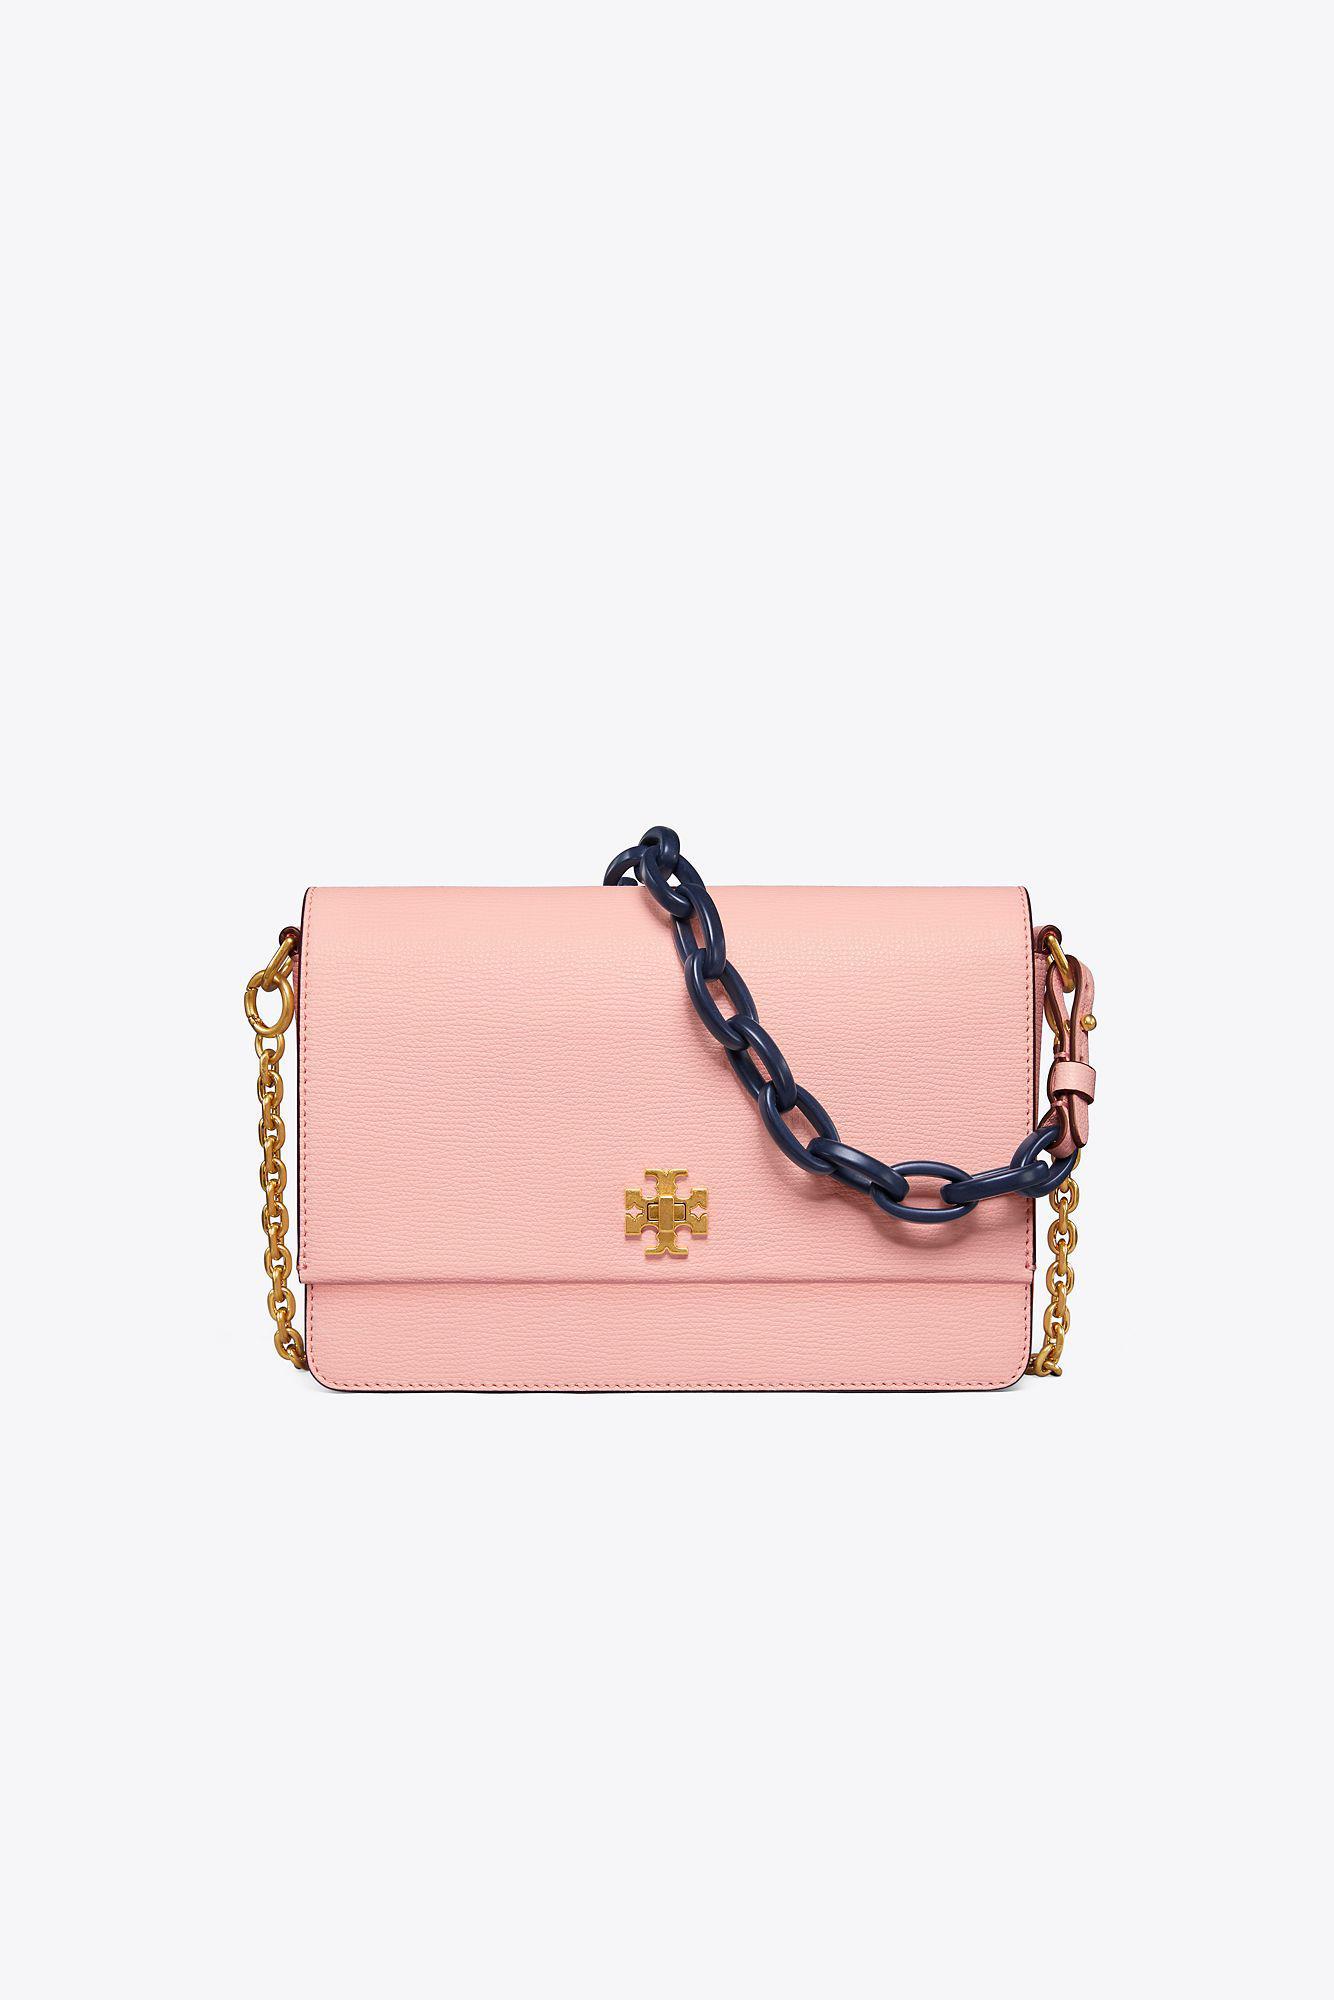 e75f3bb11de5 Tory Burch Kira Double-strap Shoulder Bag in Pink - Lyst